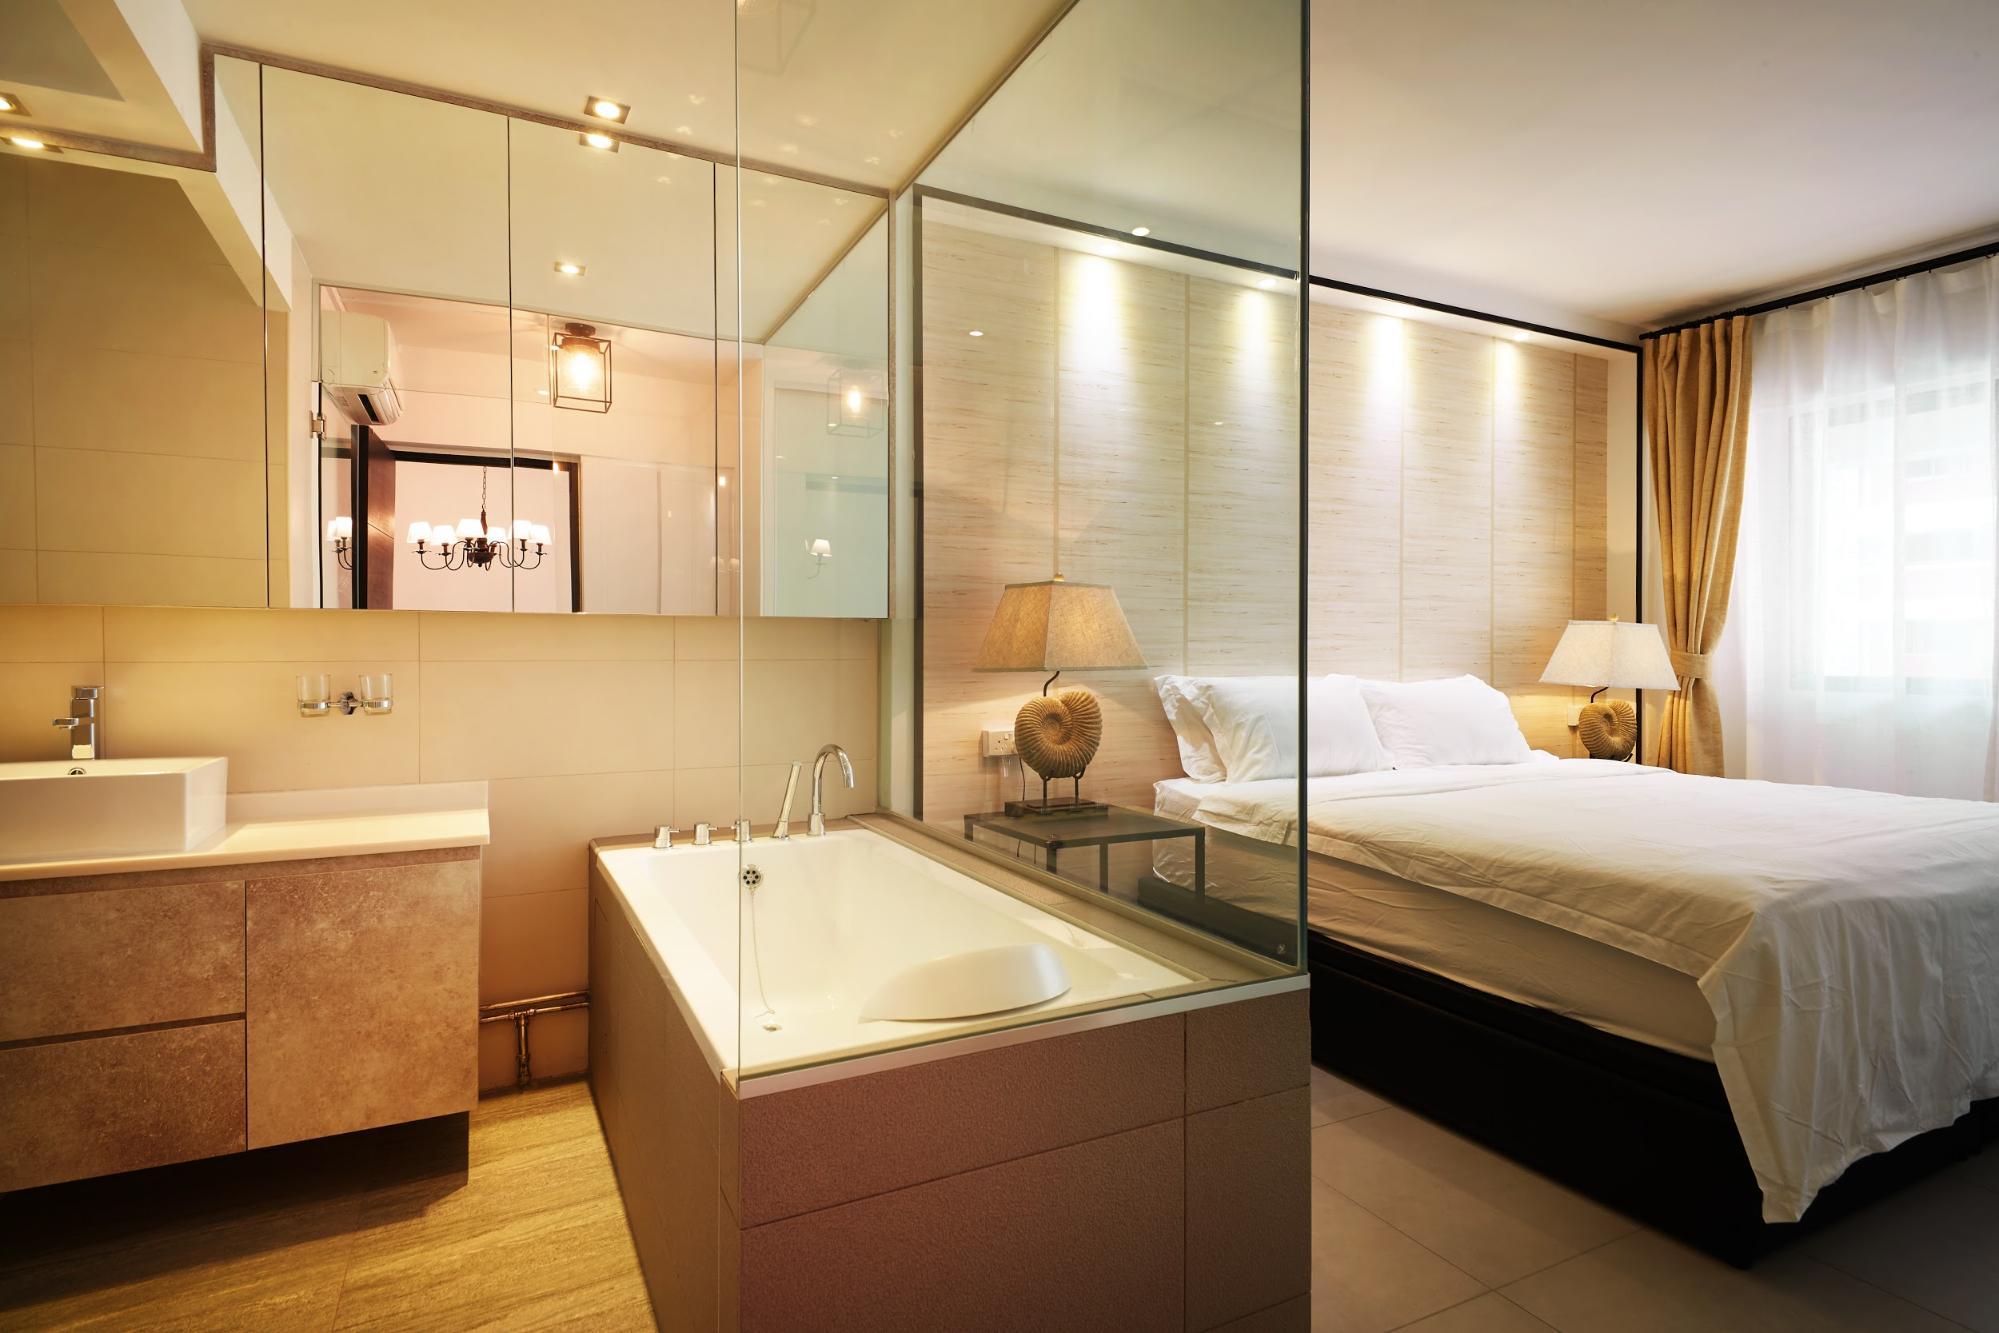 Open Concept HDB toilet